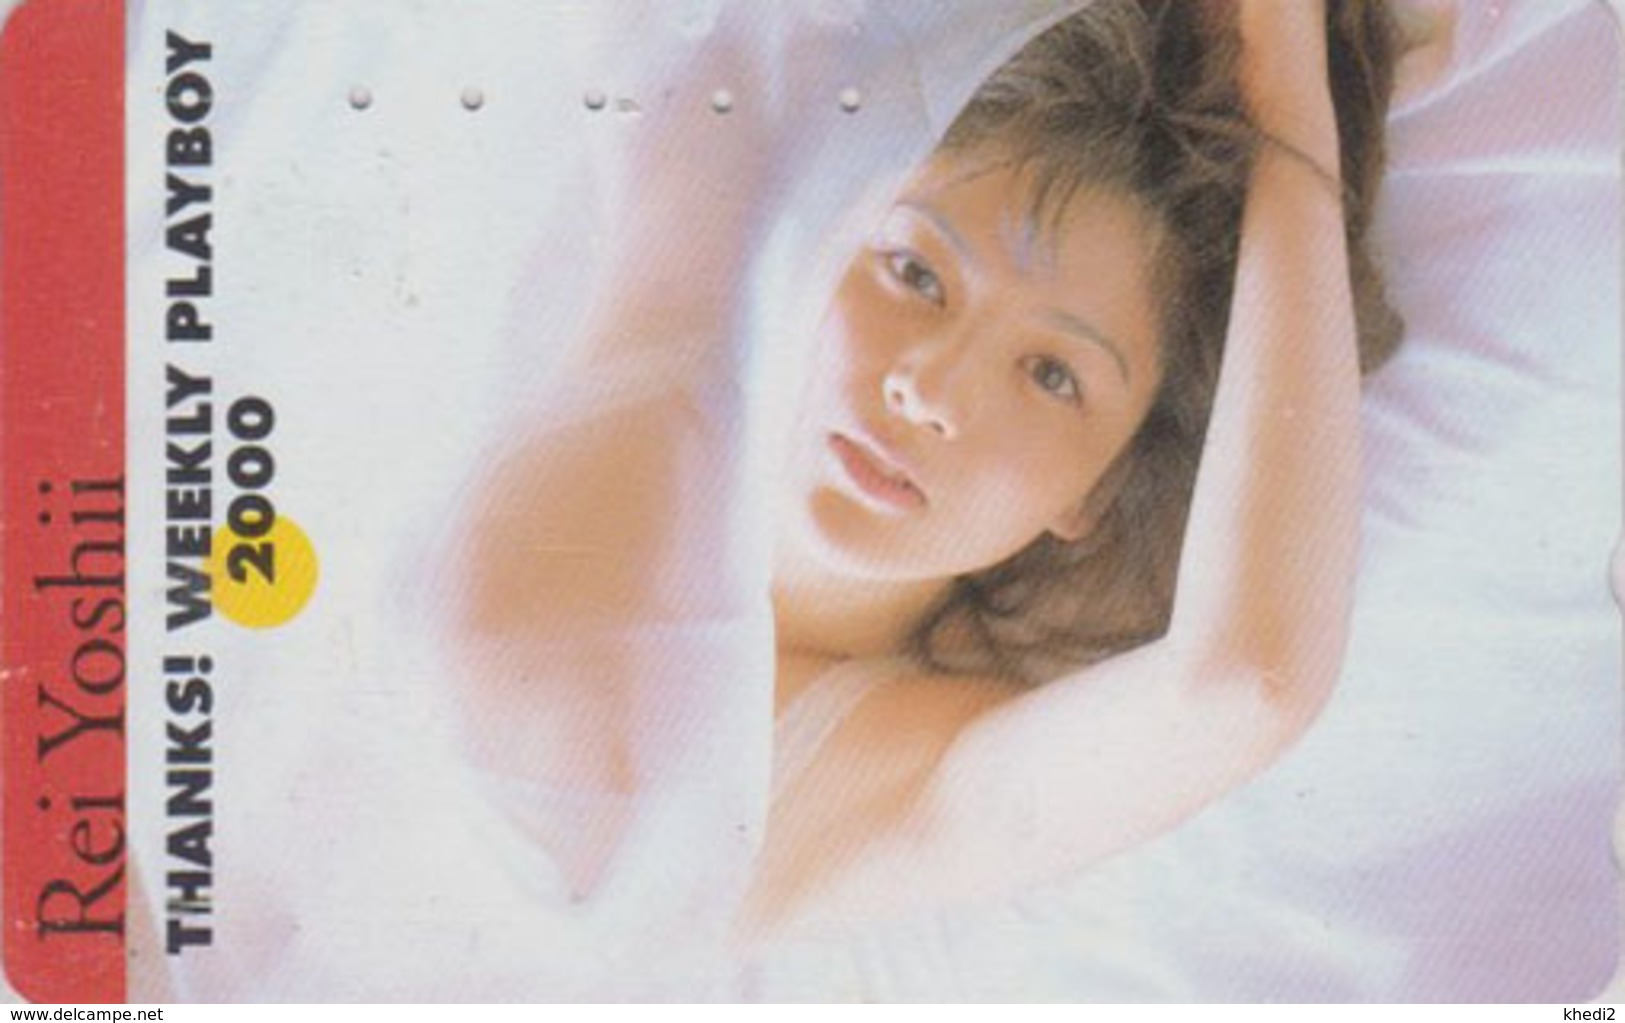 Télécarte Japon / 110-016 - PLAYBOY - FEMME - Cinema REI YOSHII - Girl Actress Movie Star Japan Phonecard - 6331 - Personnages